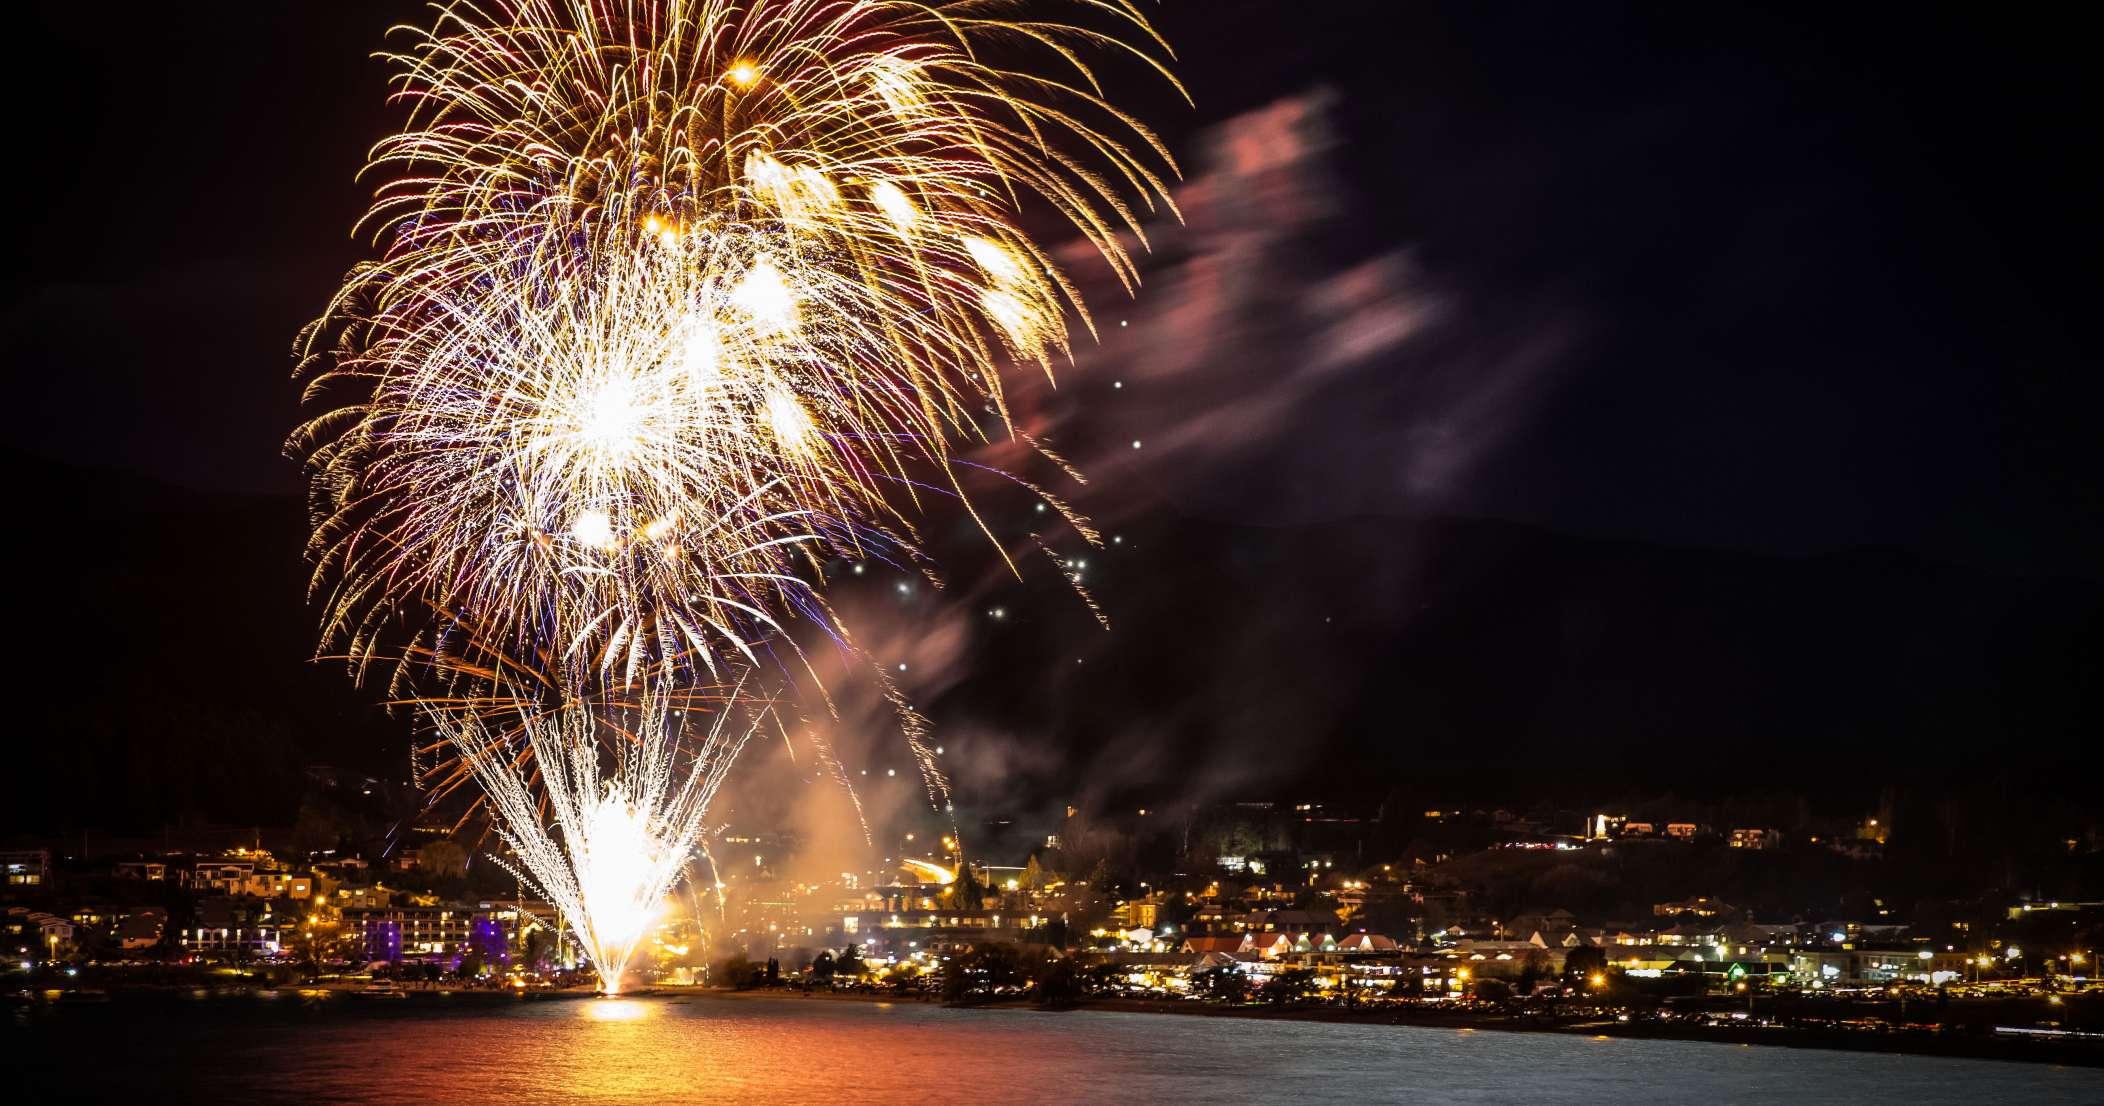 Maori New Year in Matariki, New Zealand @lakewanaka